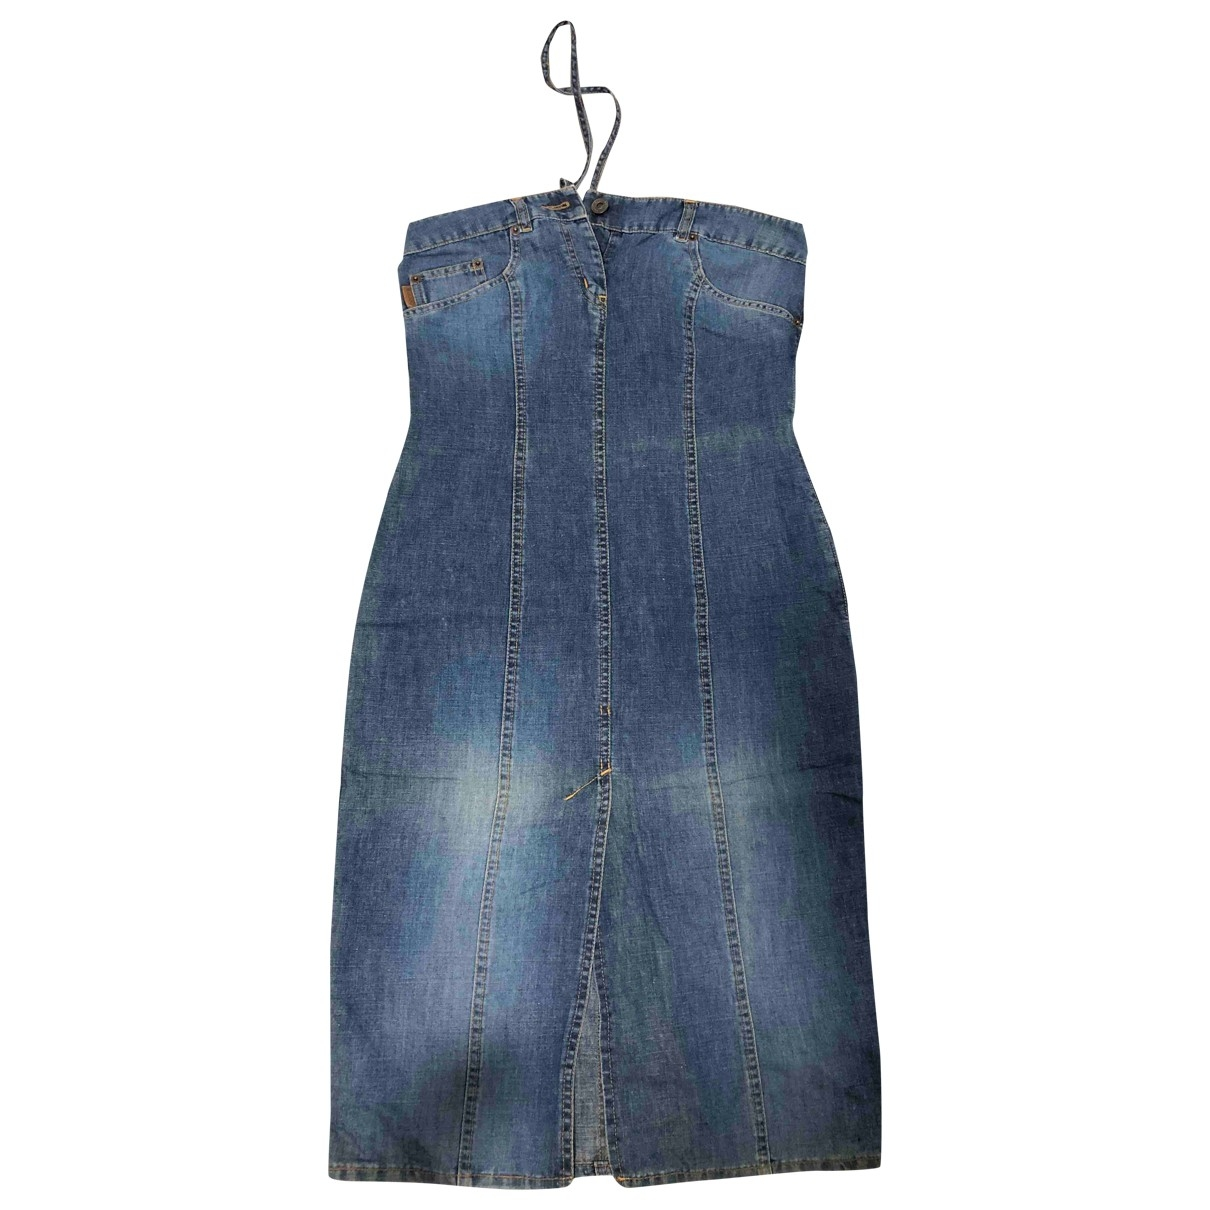 Moschino Cheap And Chic \N Kleid in  Blau Denim - Jeans